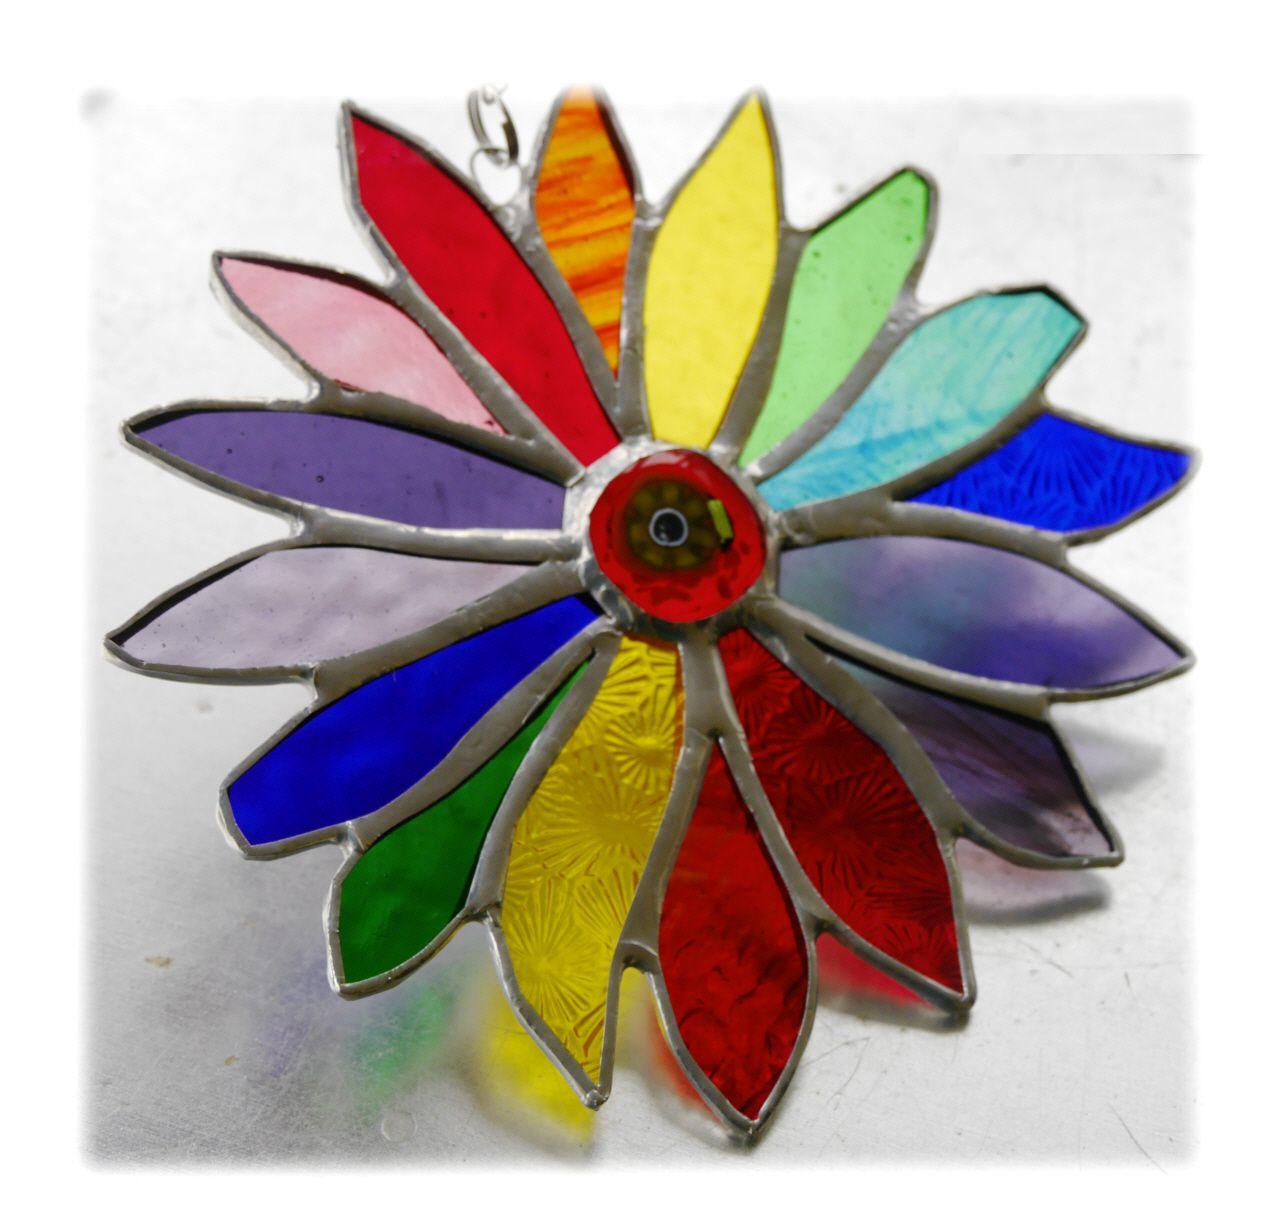 Rainbow Flower 057 #1808 FREE 17.50